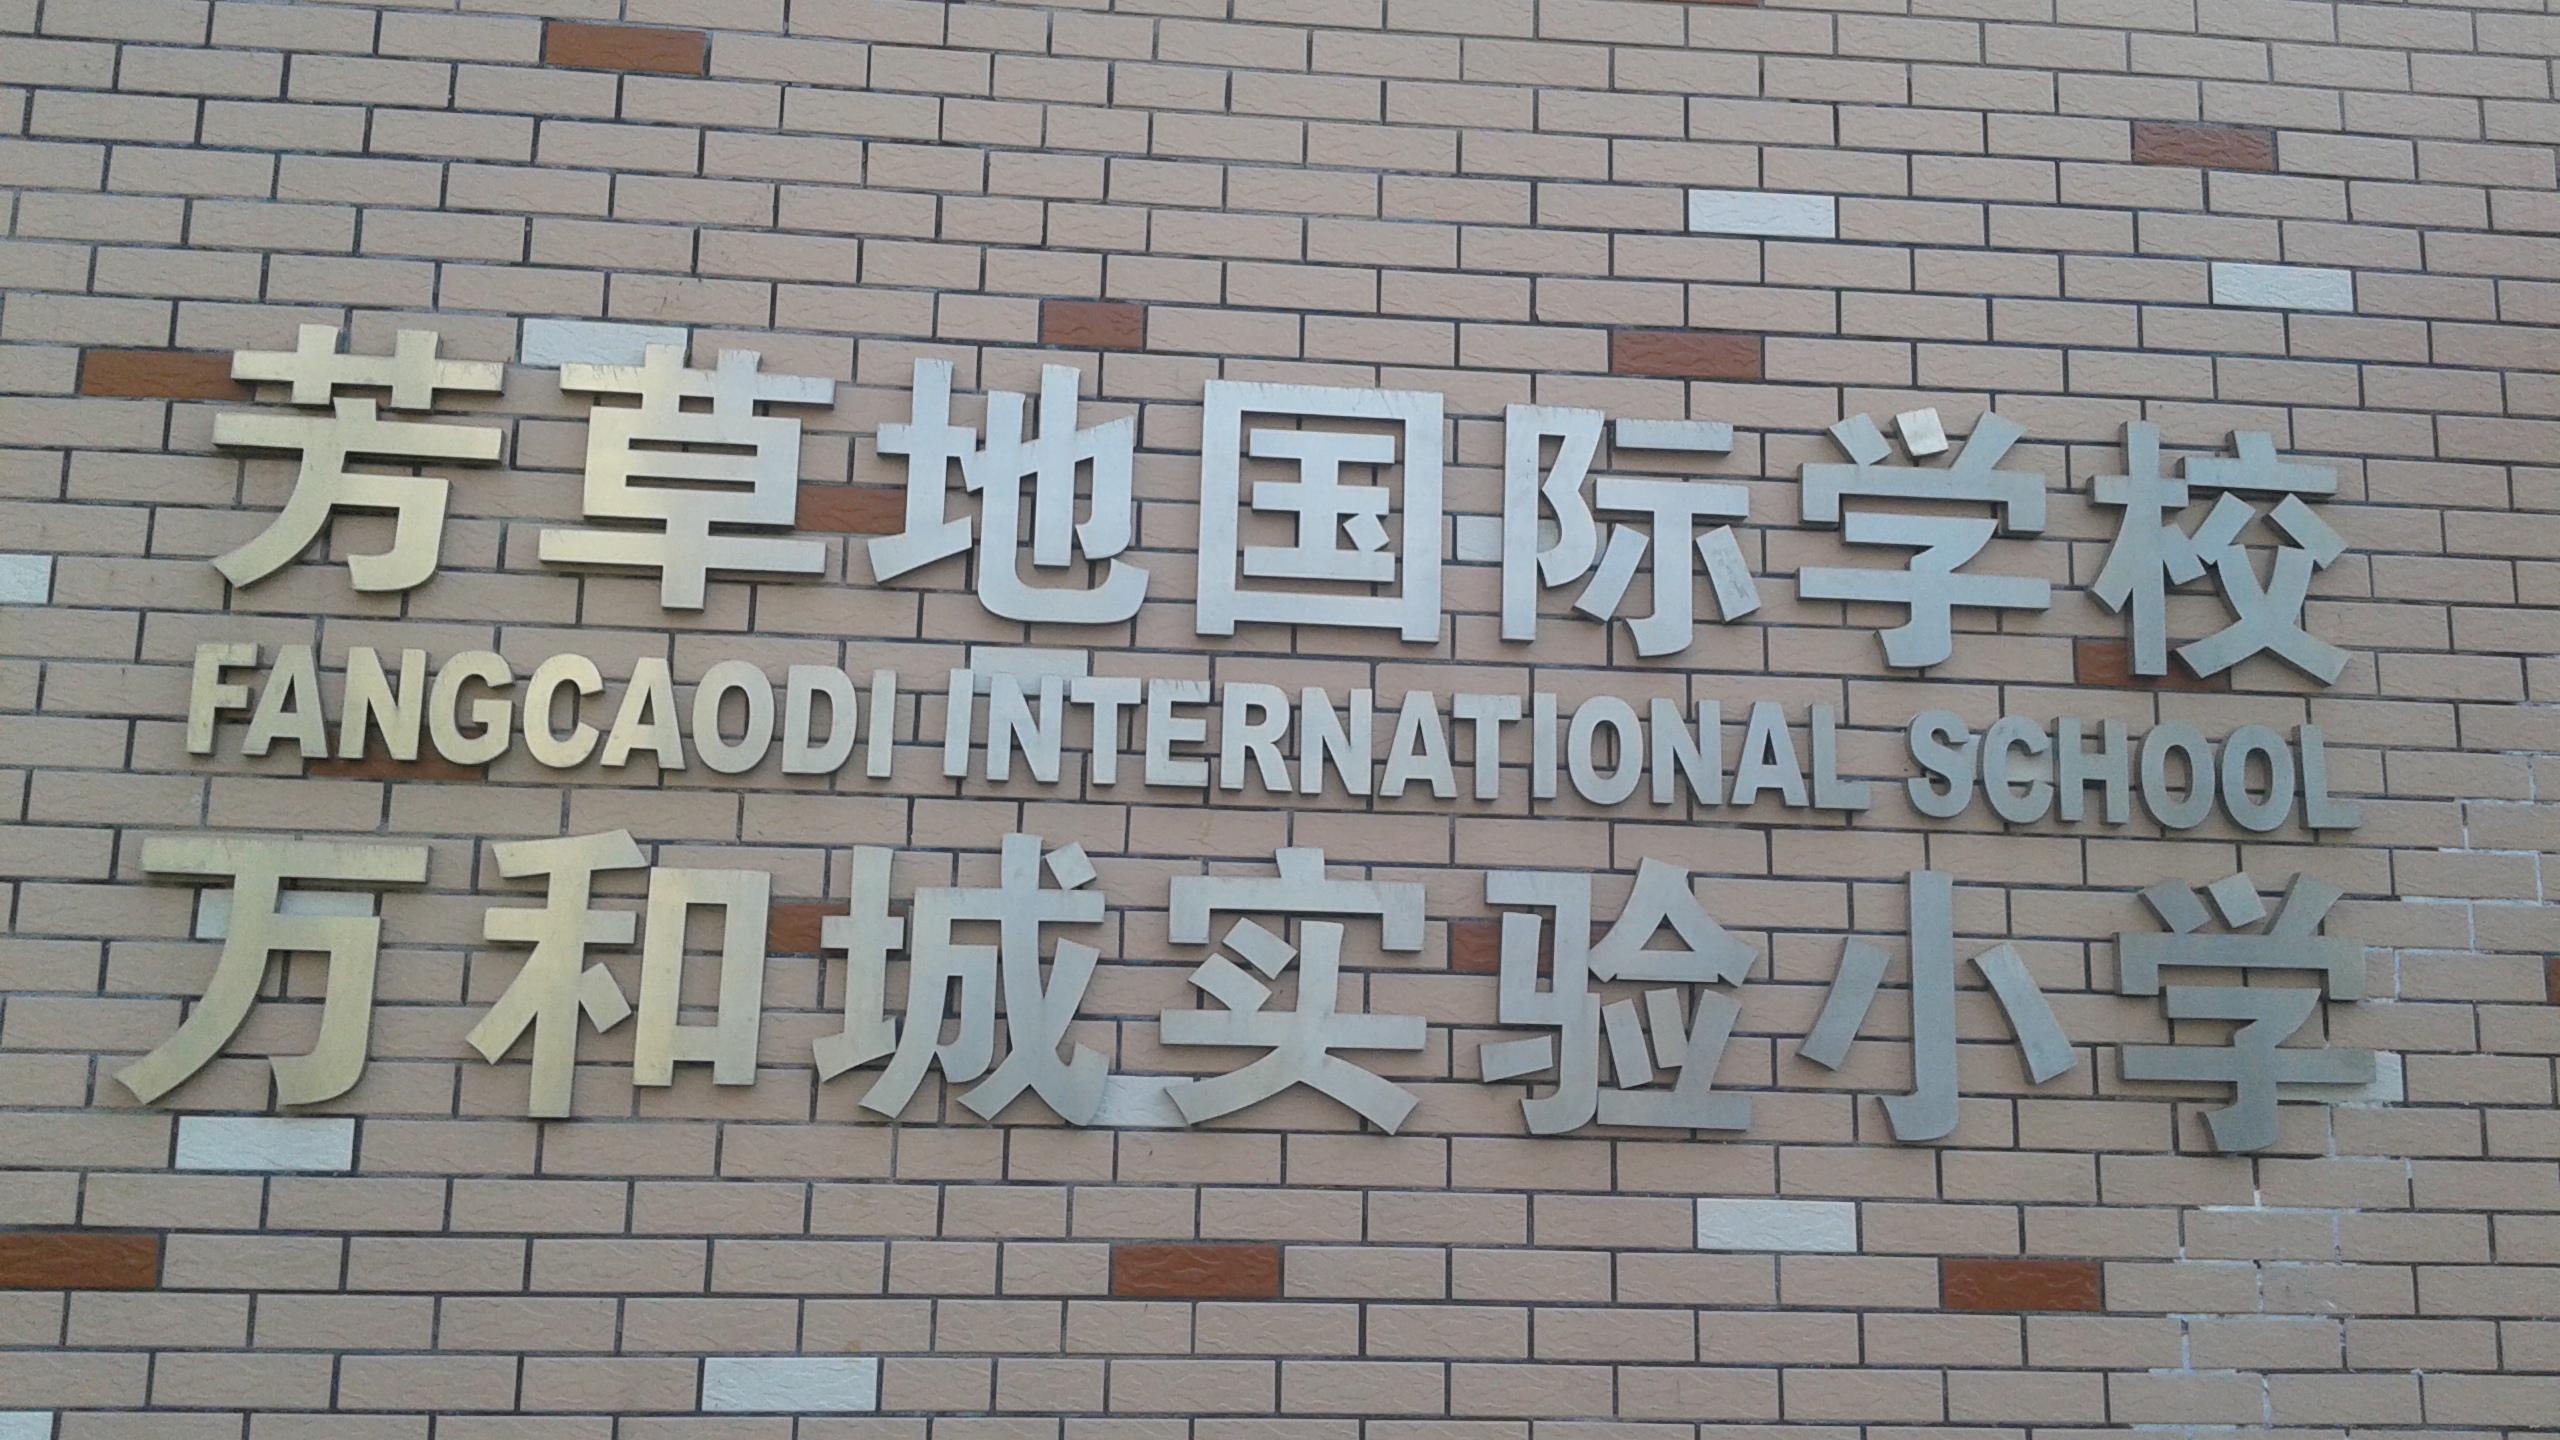 Fang Cao Di International School